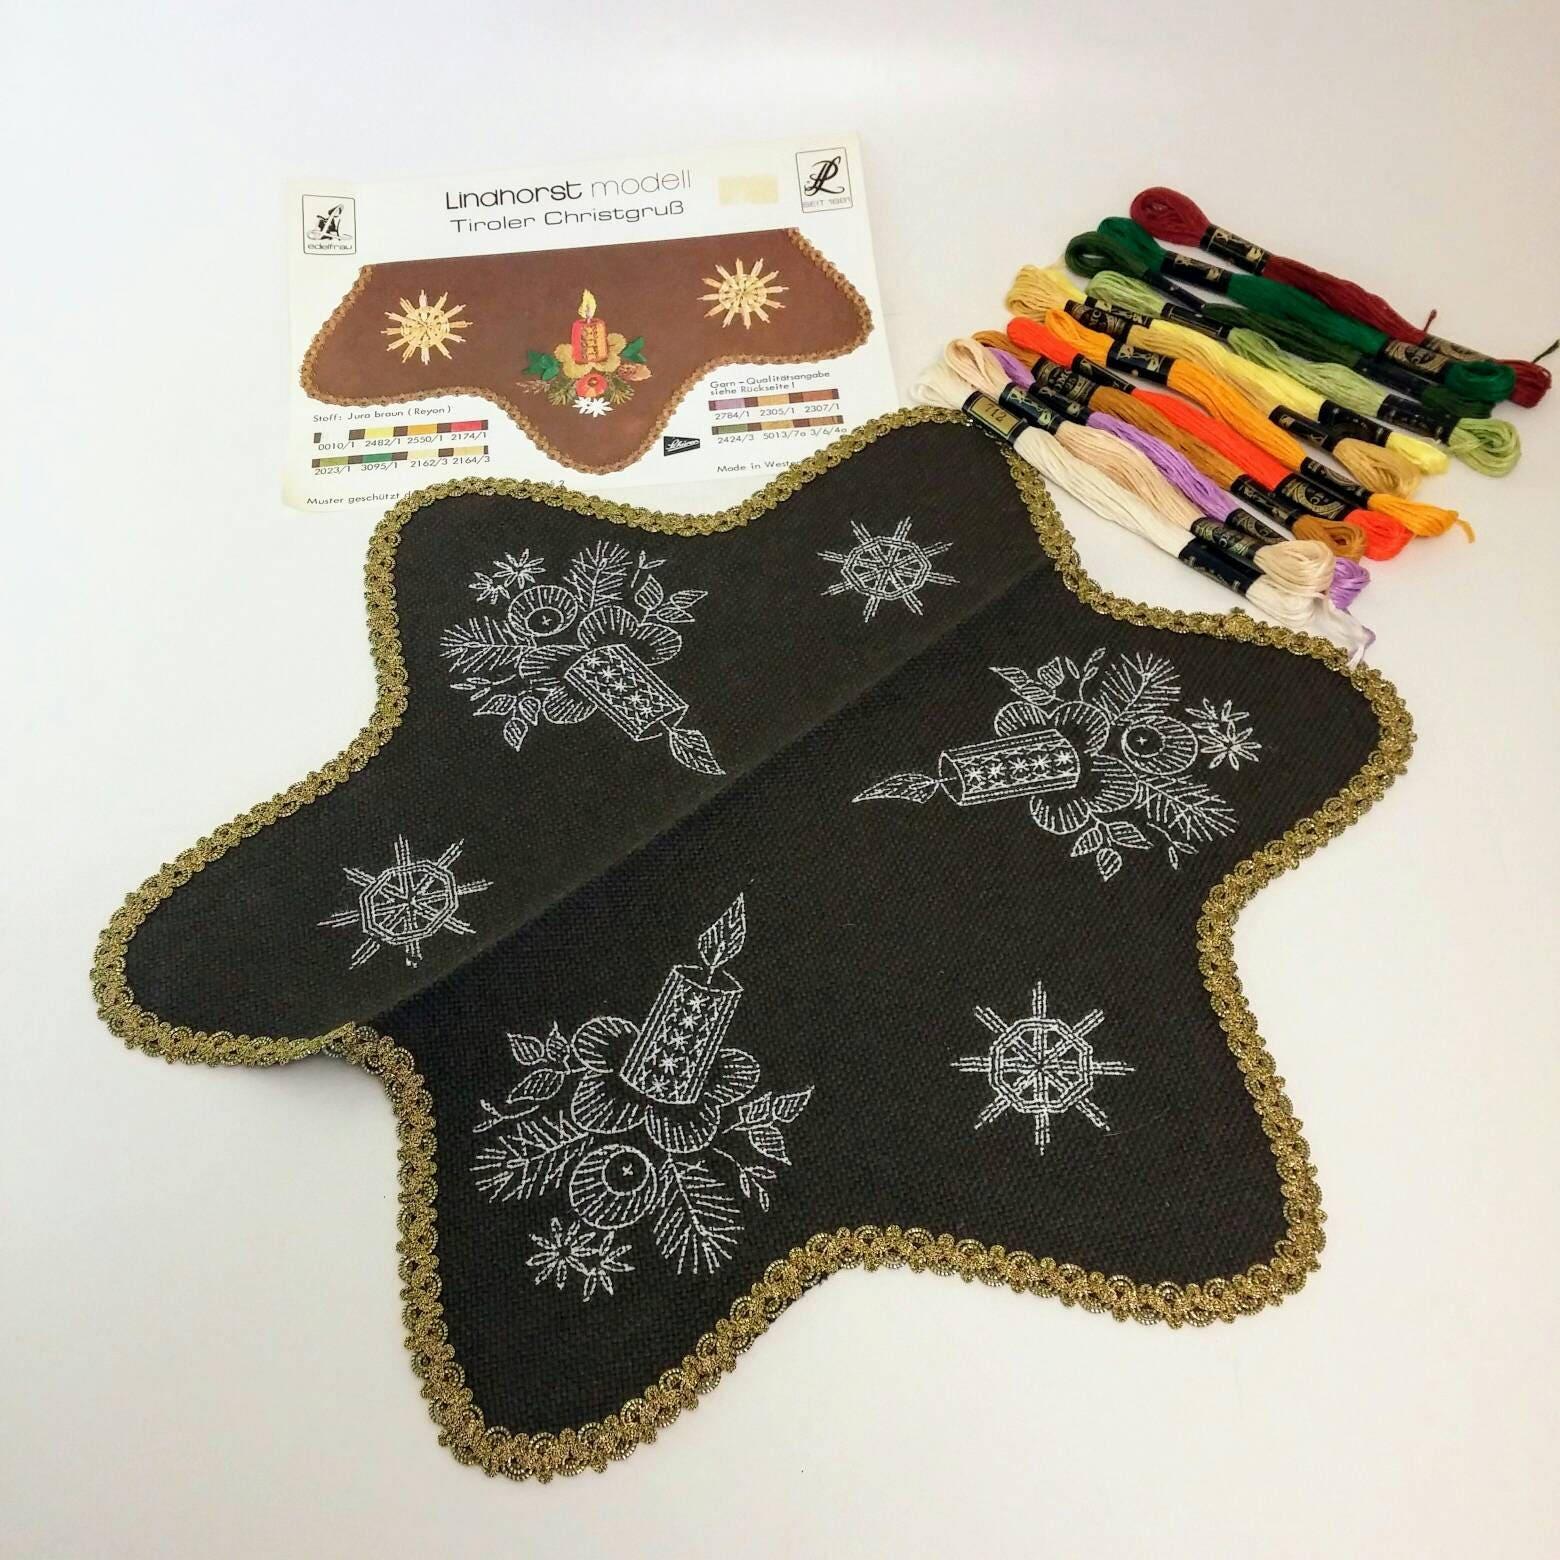 Christmas vintage embroidery table linen kit